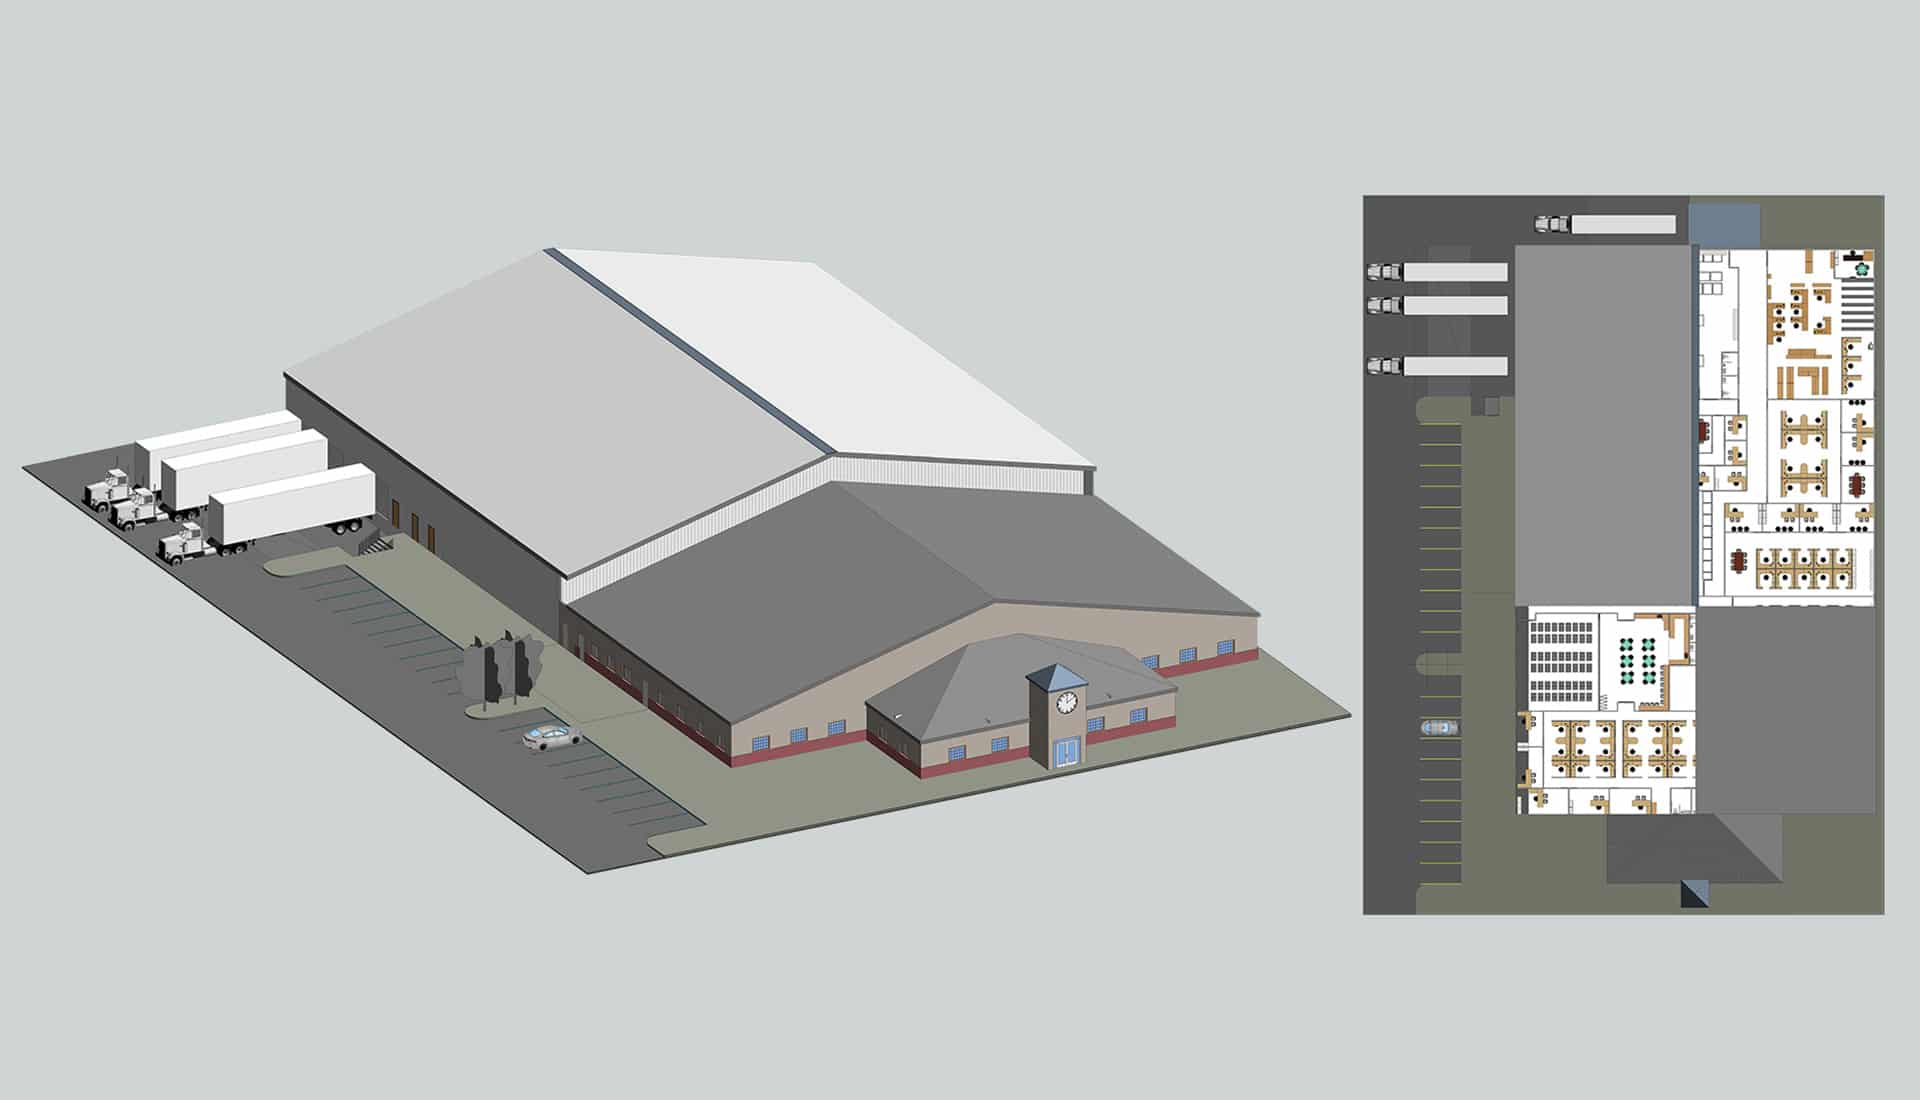 7D-Facility-Management-BIM-Dimensions